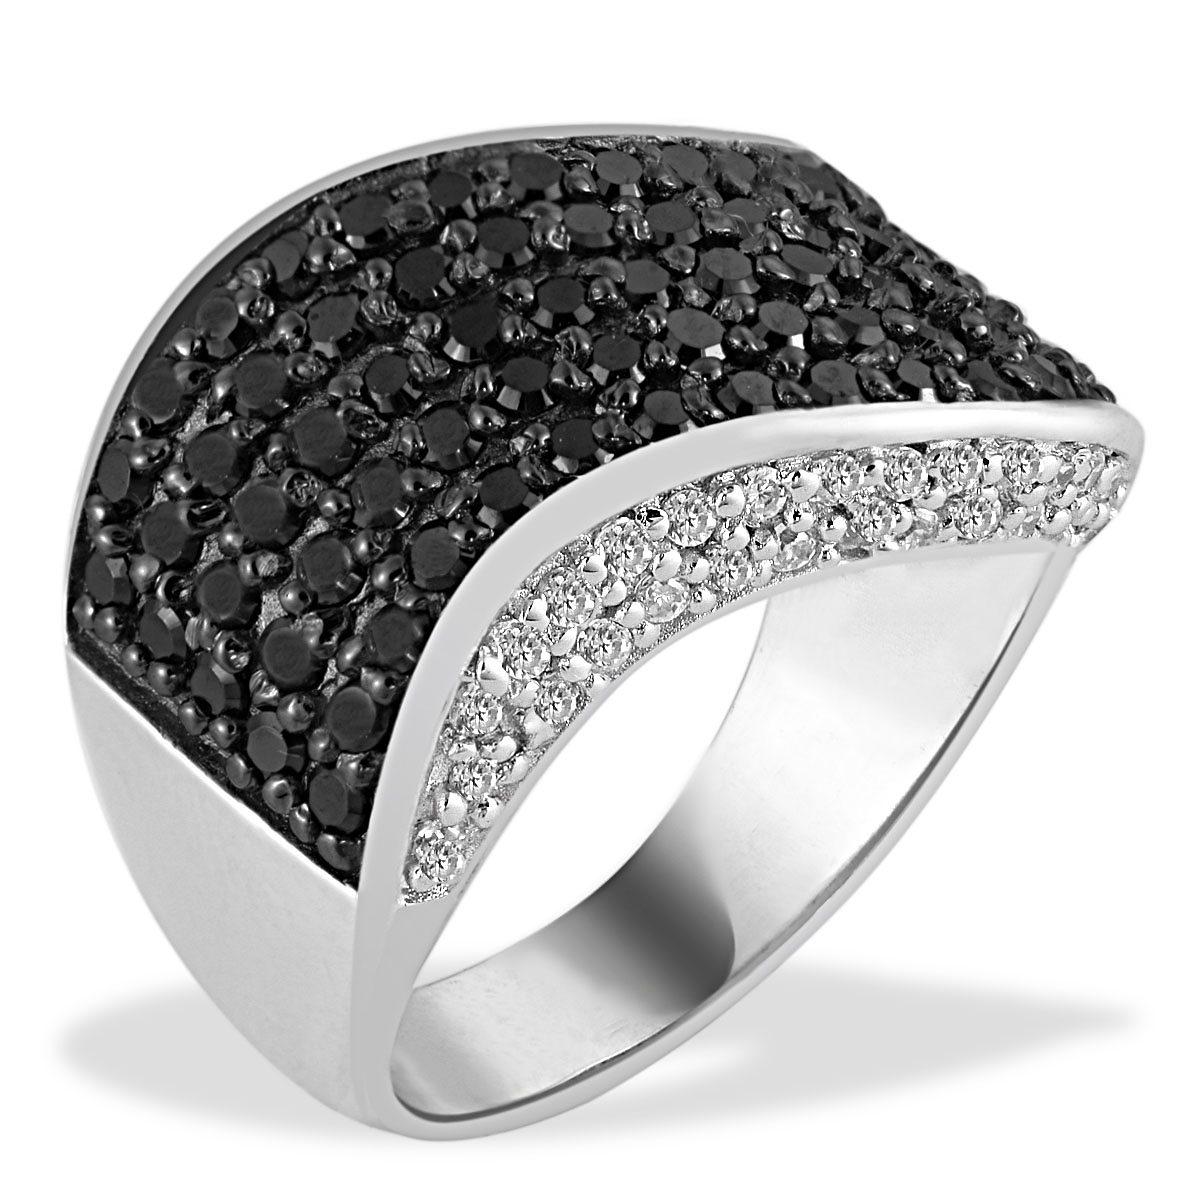 Averdin Damenring Silber 925/- schwarz weisse Zirkonia